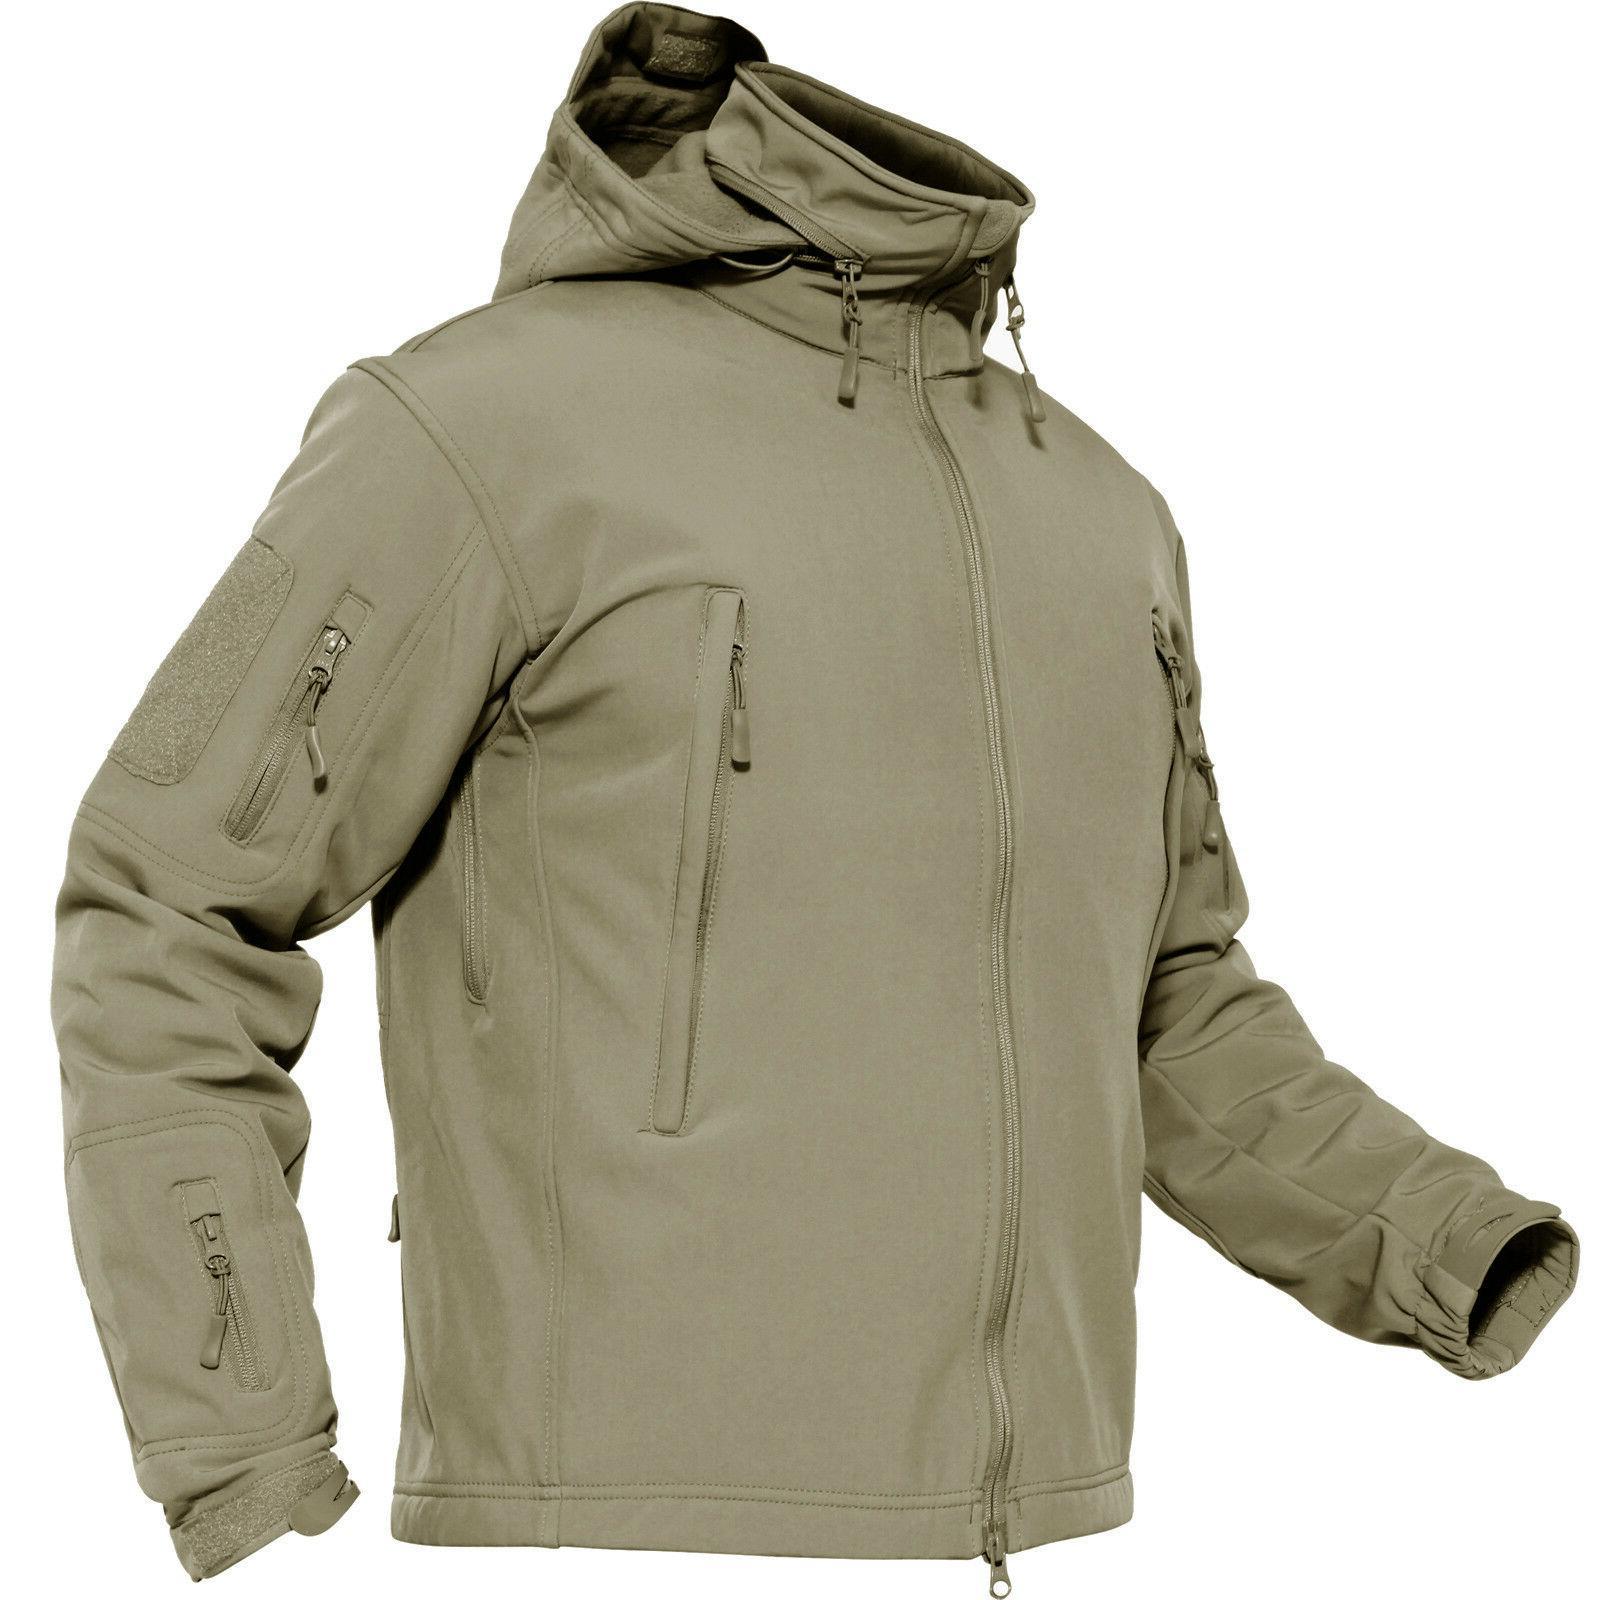 TACVASEN Jackets Outdoor